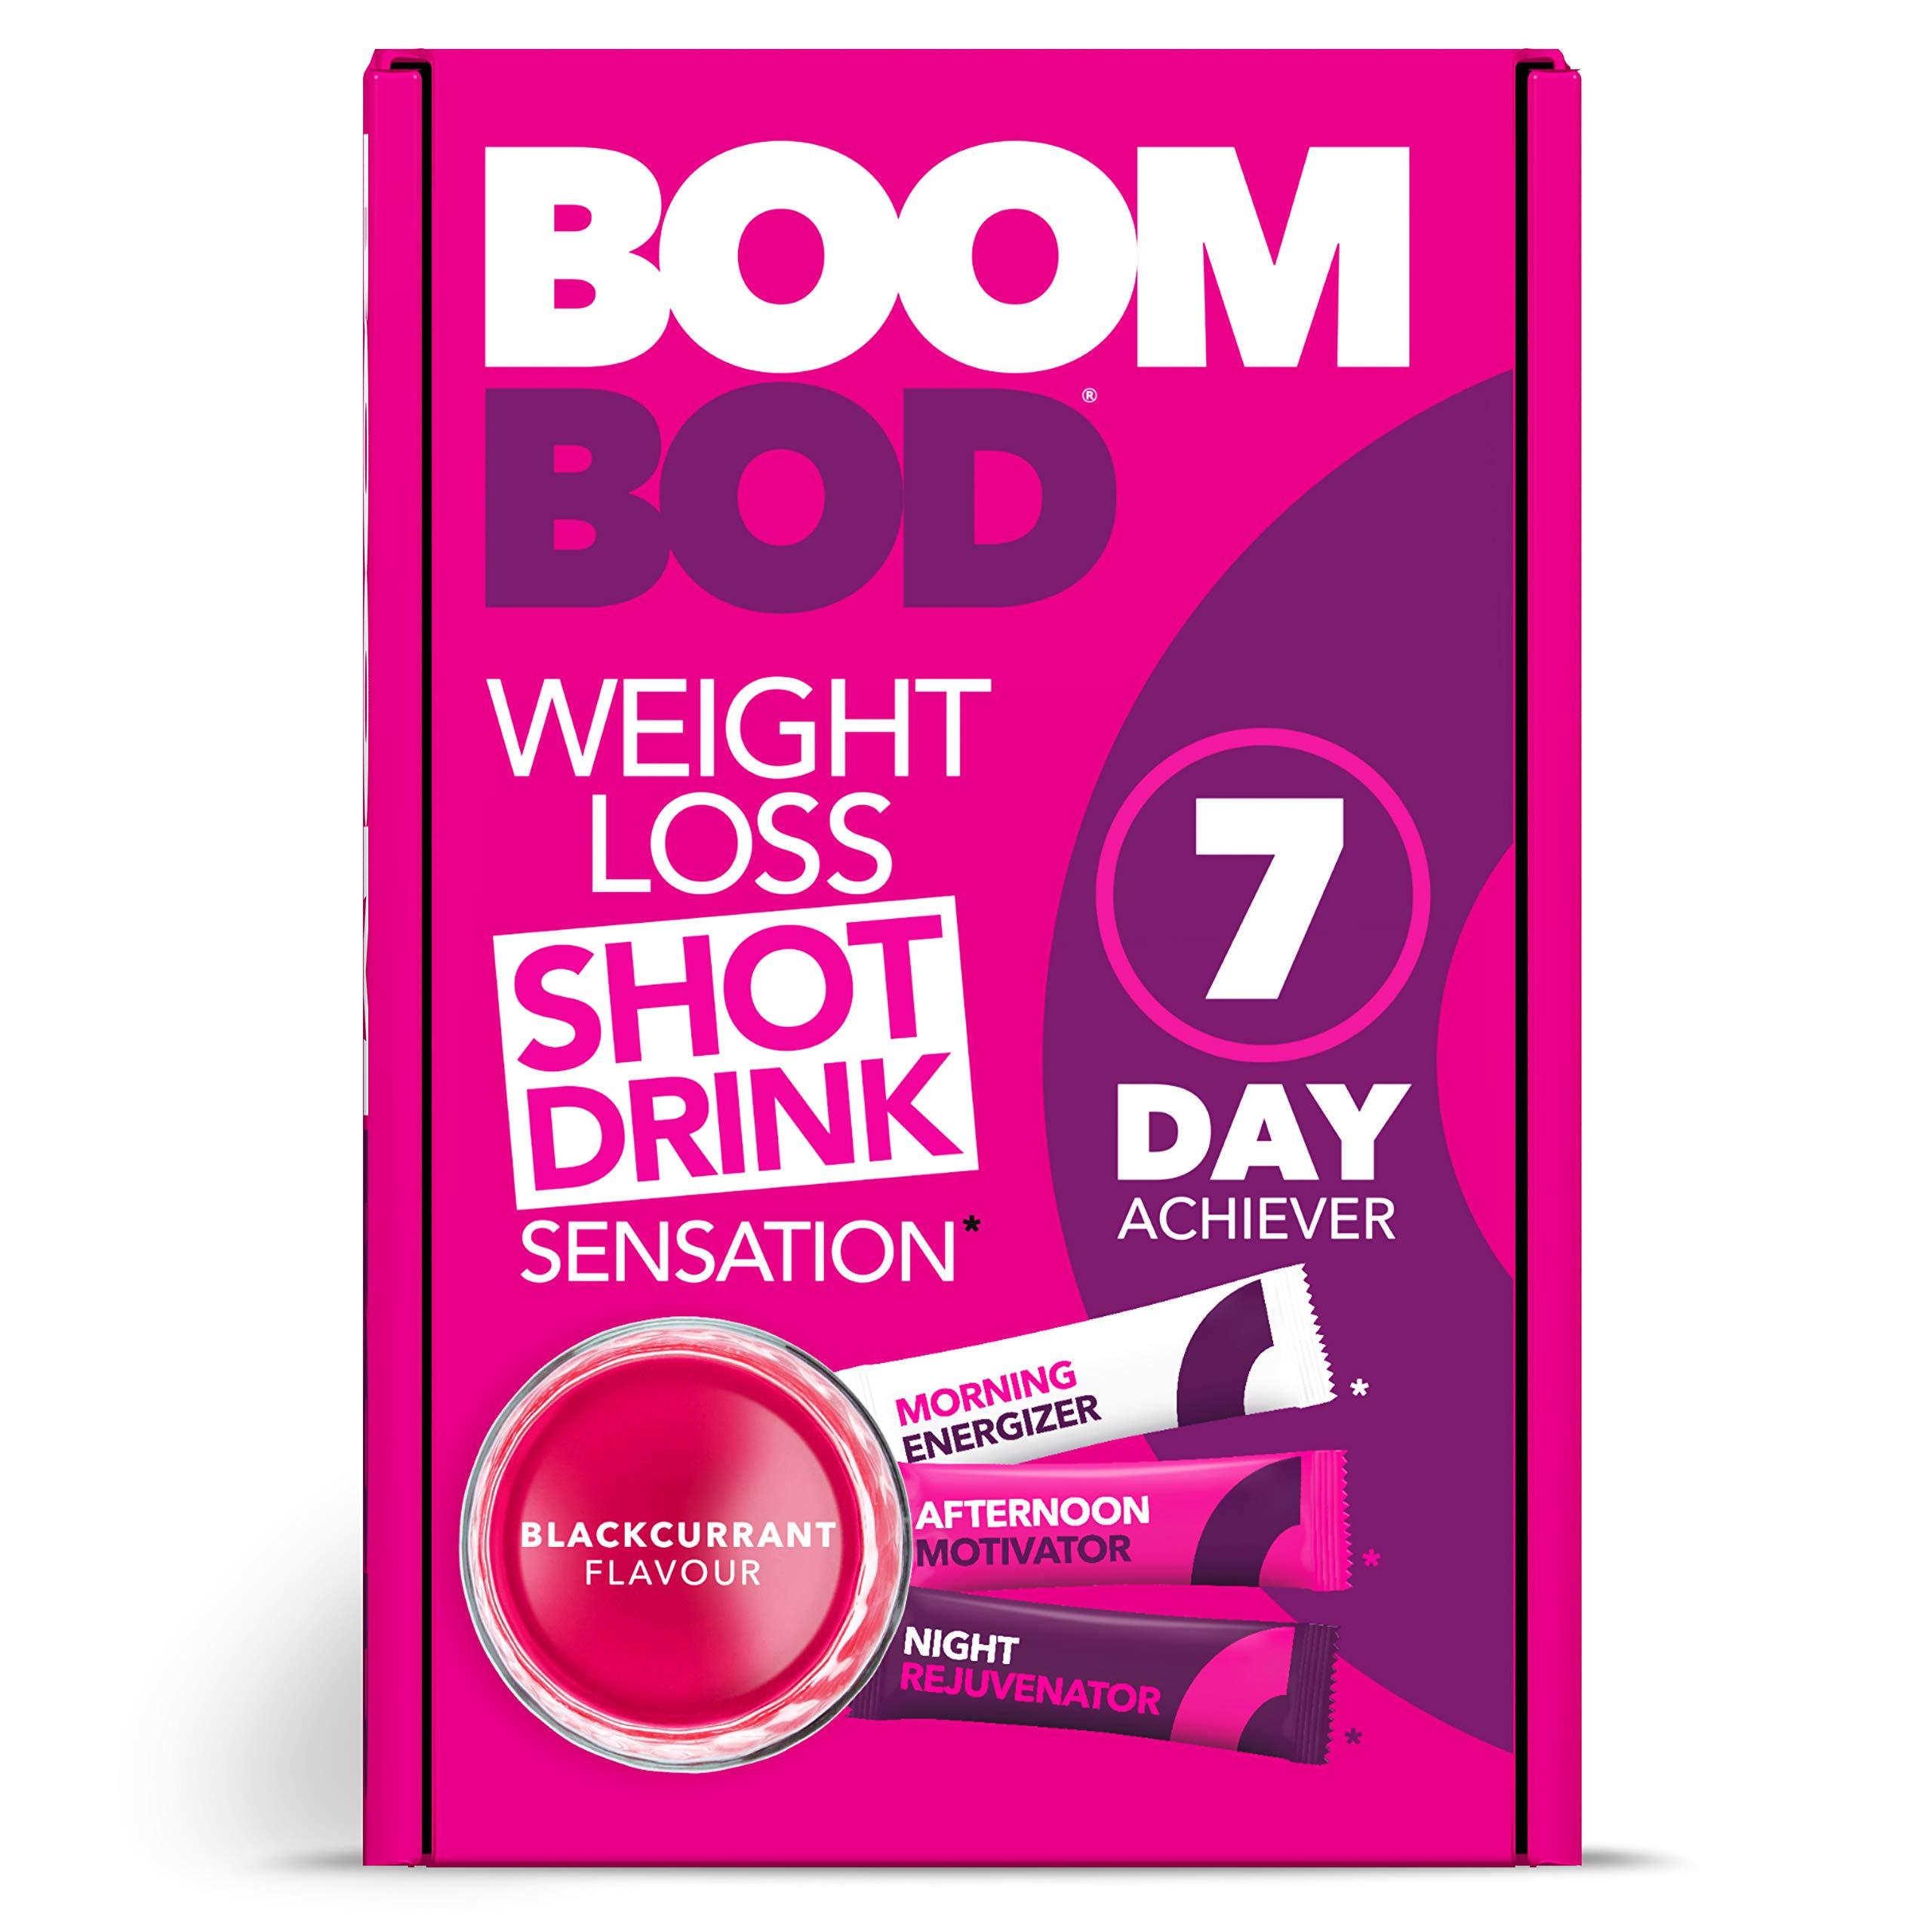 Boombod Weight Loss Shot Drink, Glucomannan, High Potency, Diet & Exercise Enhancement, Promote Fat Loss, Keto & Vegetarian Friendly, Sugar & Aspartame Free, Gluten-Free | Blackcurrant Flavor